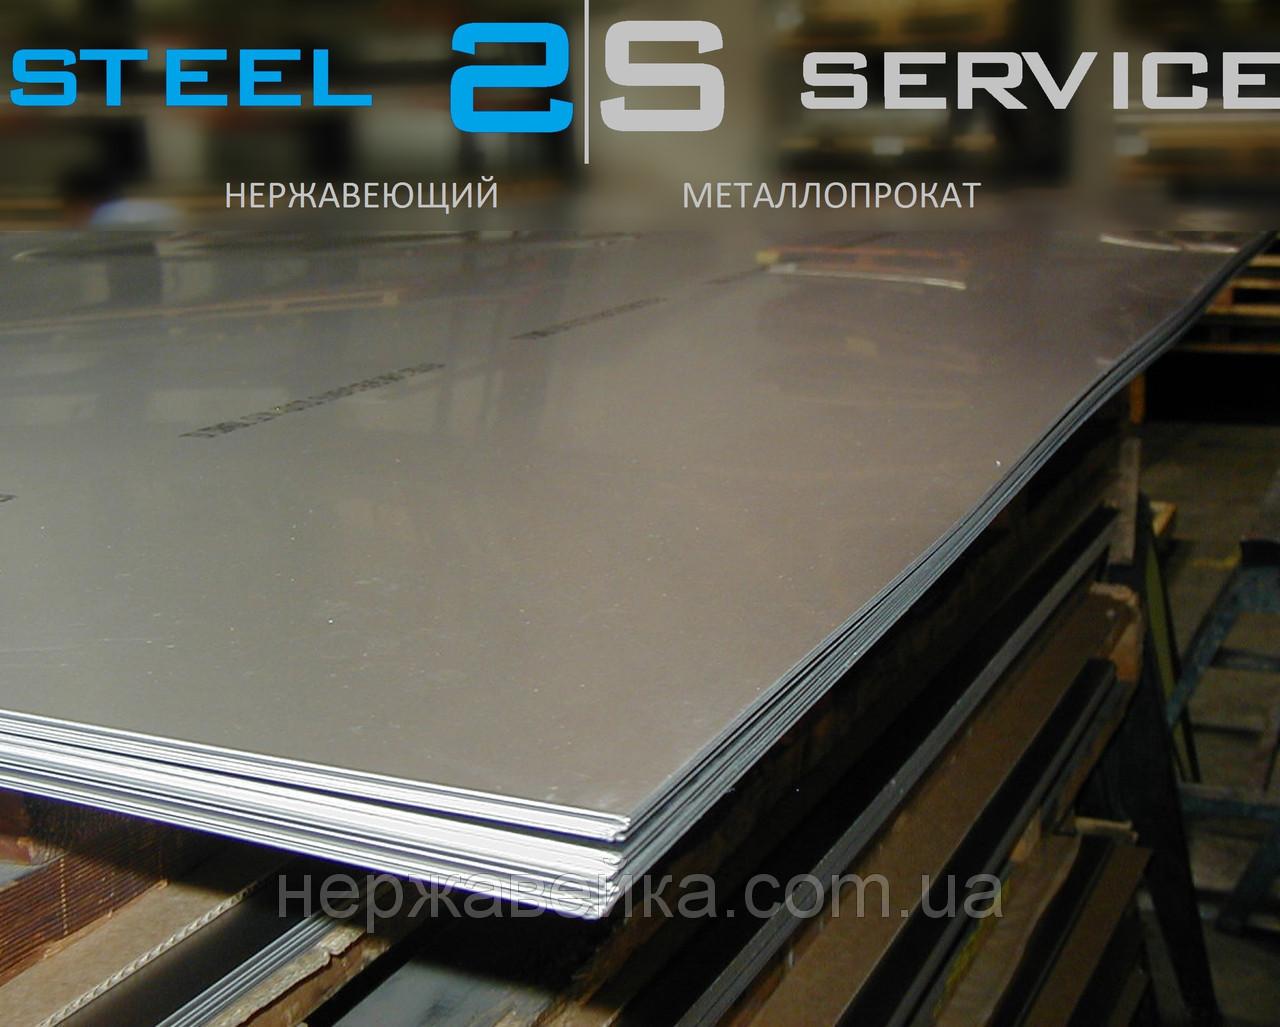 Нержавеющий лист 6х1500х3000мм AISI 316L(03Х17Н14М3) F1 - горячекатанный,  кислотостойкий